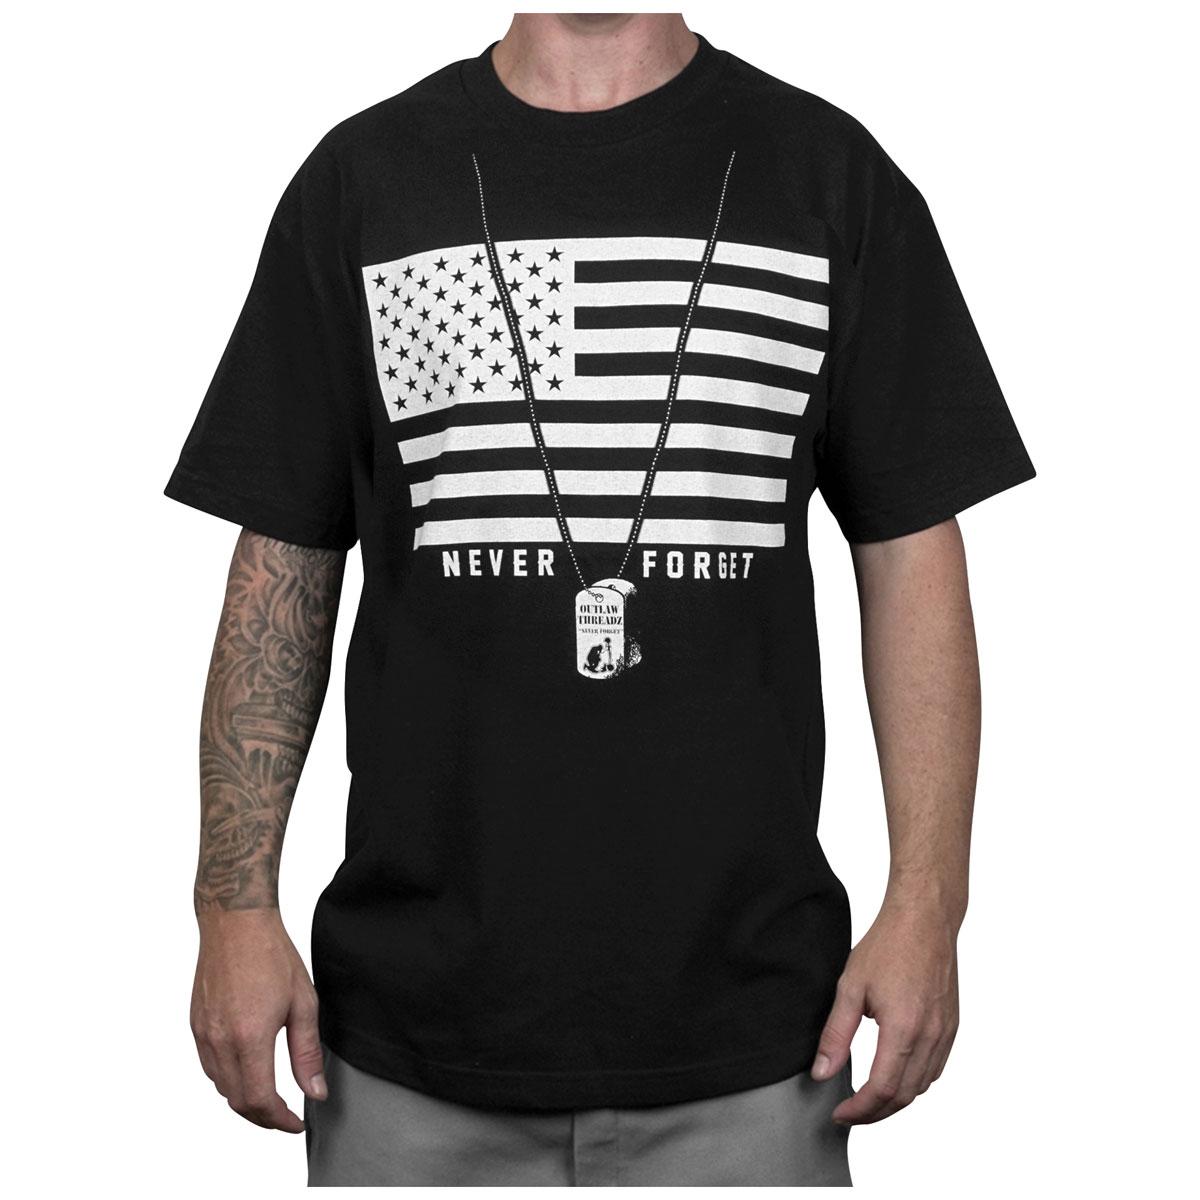 Outlaw Threadz Men's Patriot Black T-Shirt